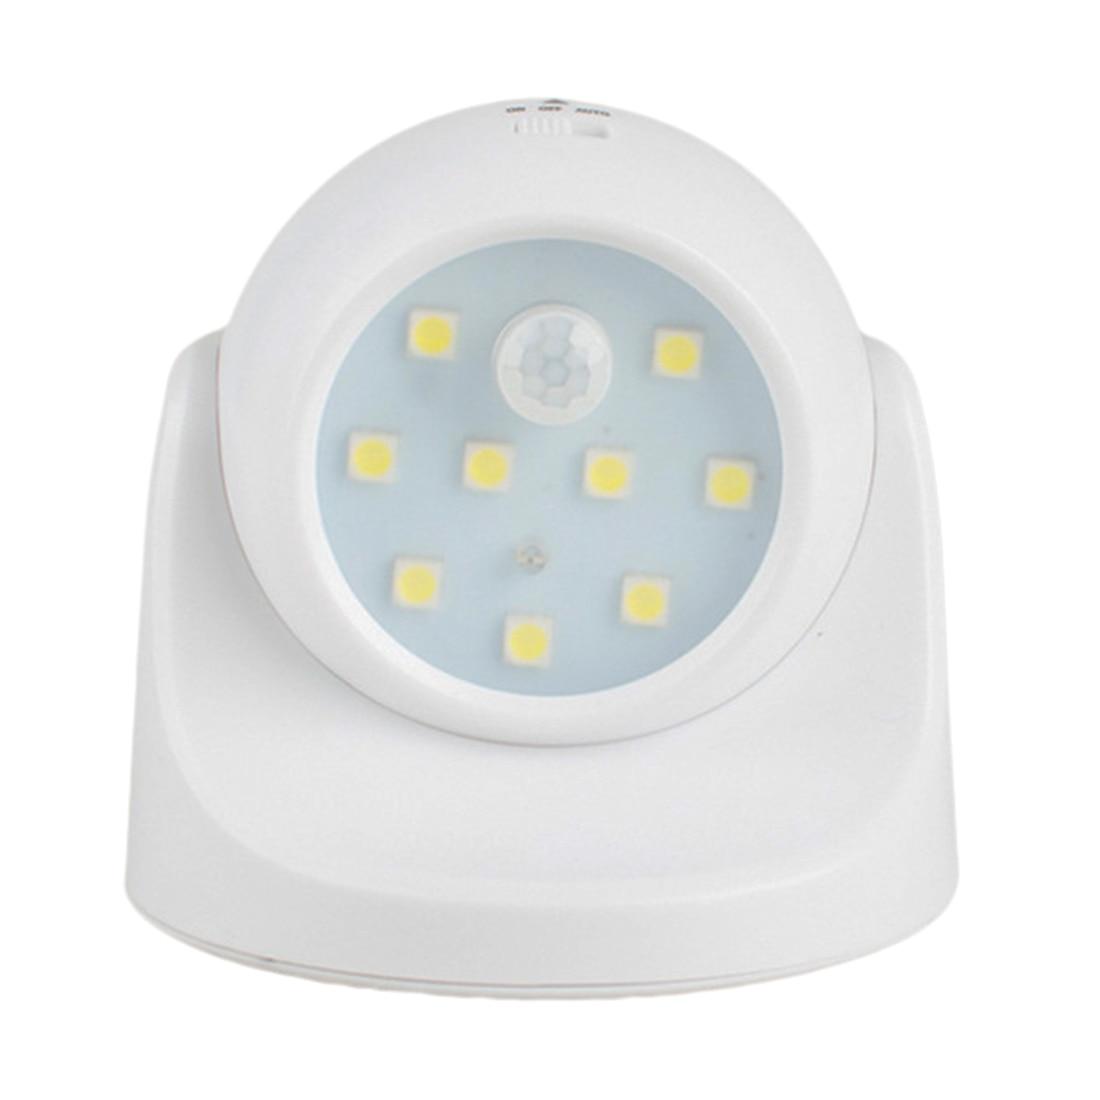 9 LED 360 Degree Rotation Motion Sensor PIR Night Light Battery Operated Corridor Wall Night Lamp For Closet Garages Hallway